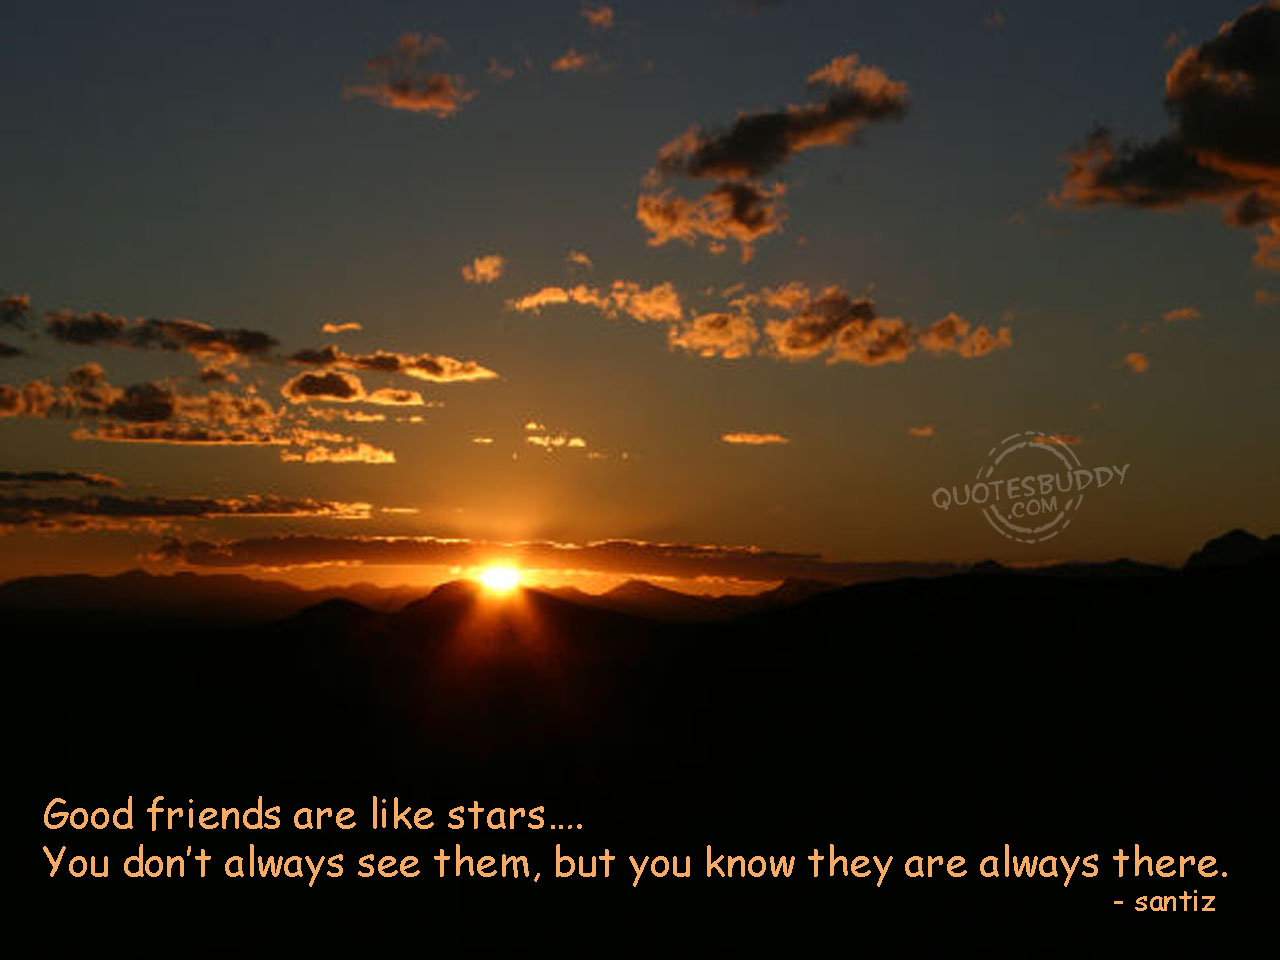 http://1.bp.blogspot.com/_e8kLsWOPQjY/S9GNR0dSI1I/AAAAAAAACPA/IjzMTMpGZC8/s1600/Best-Friend-Graphic-Quotes-Wallpapers-4.jpg